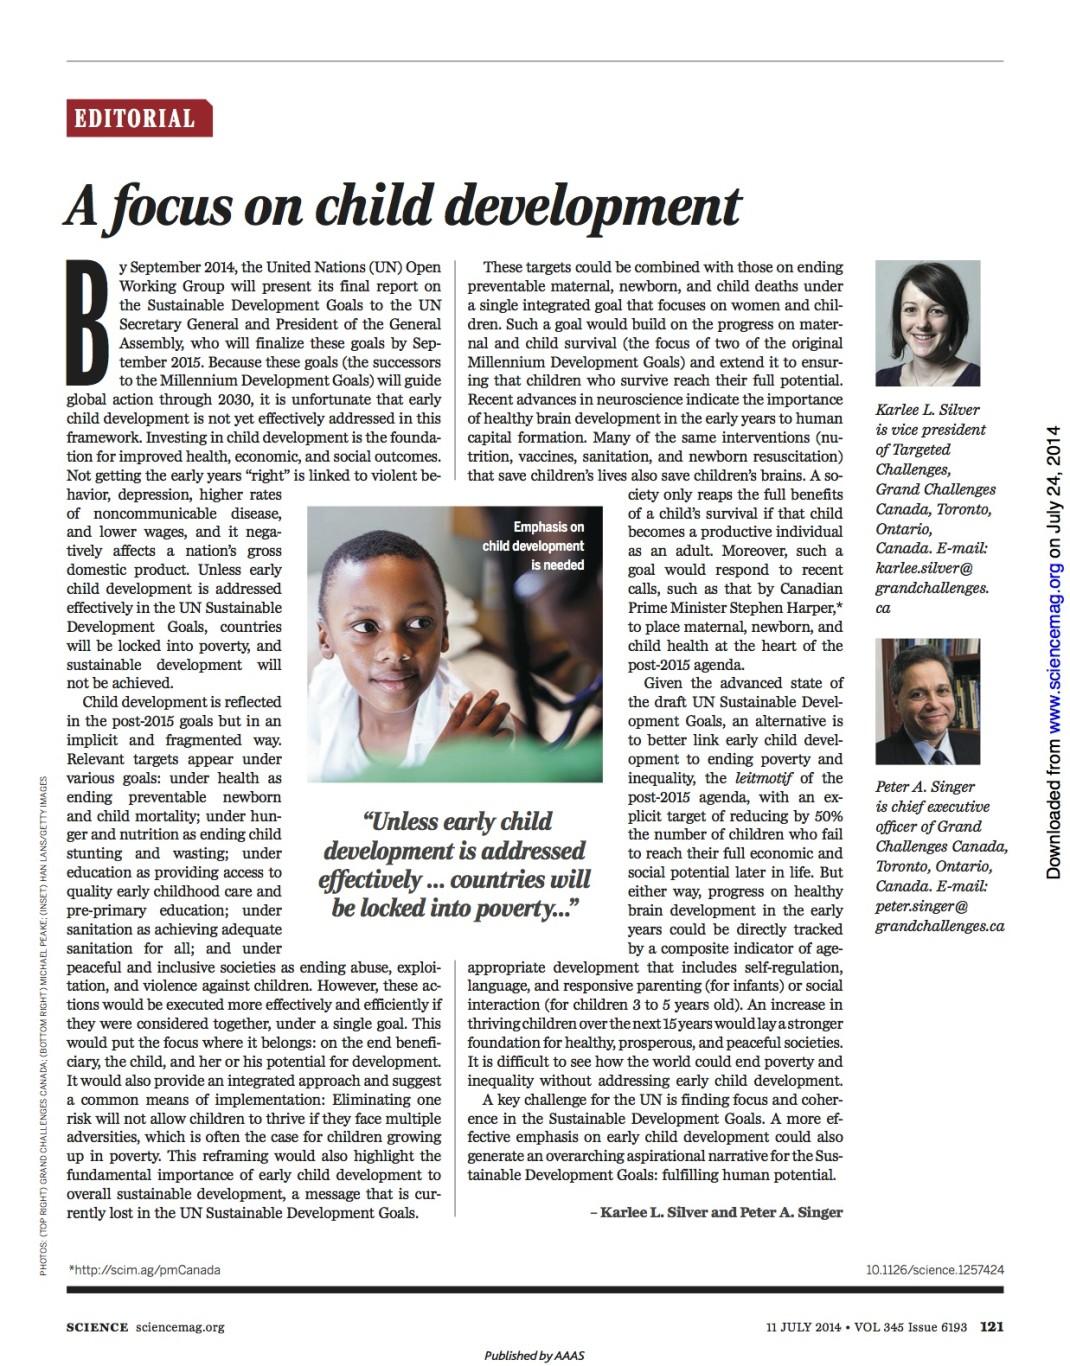 the key states in childhood development